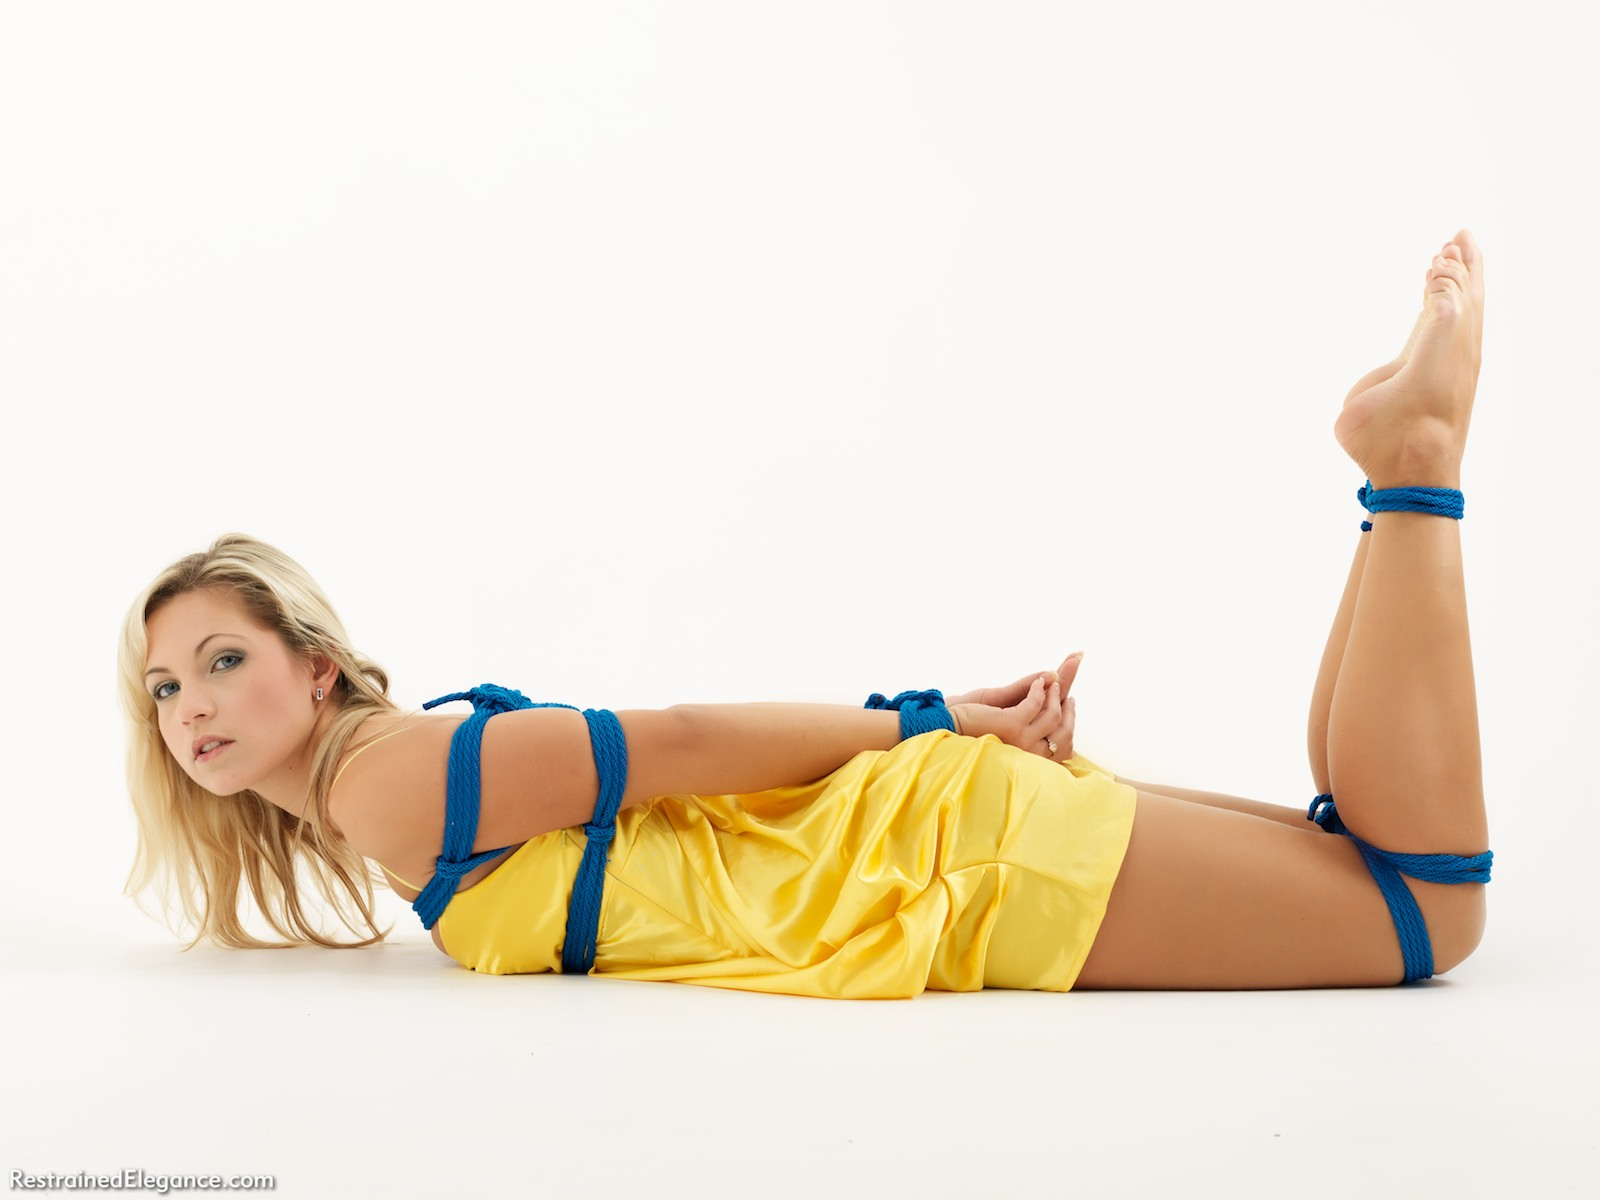 erotiska underkläder dam hard bondage